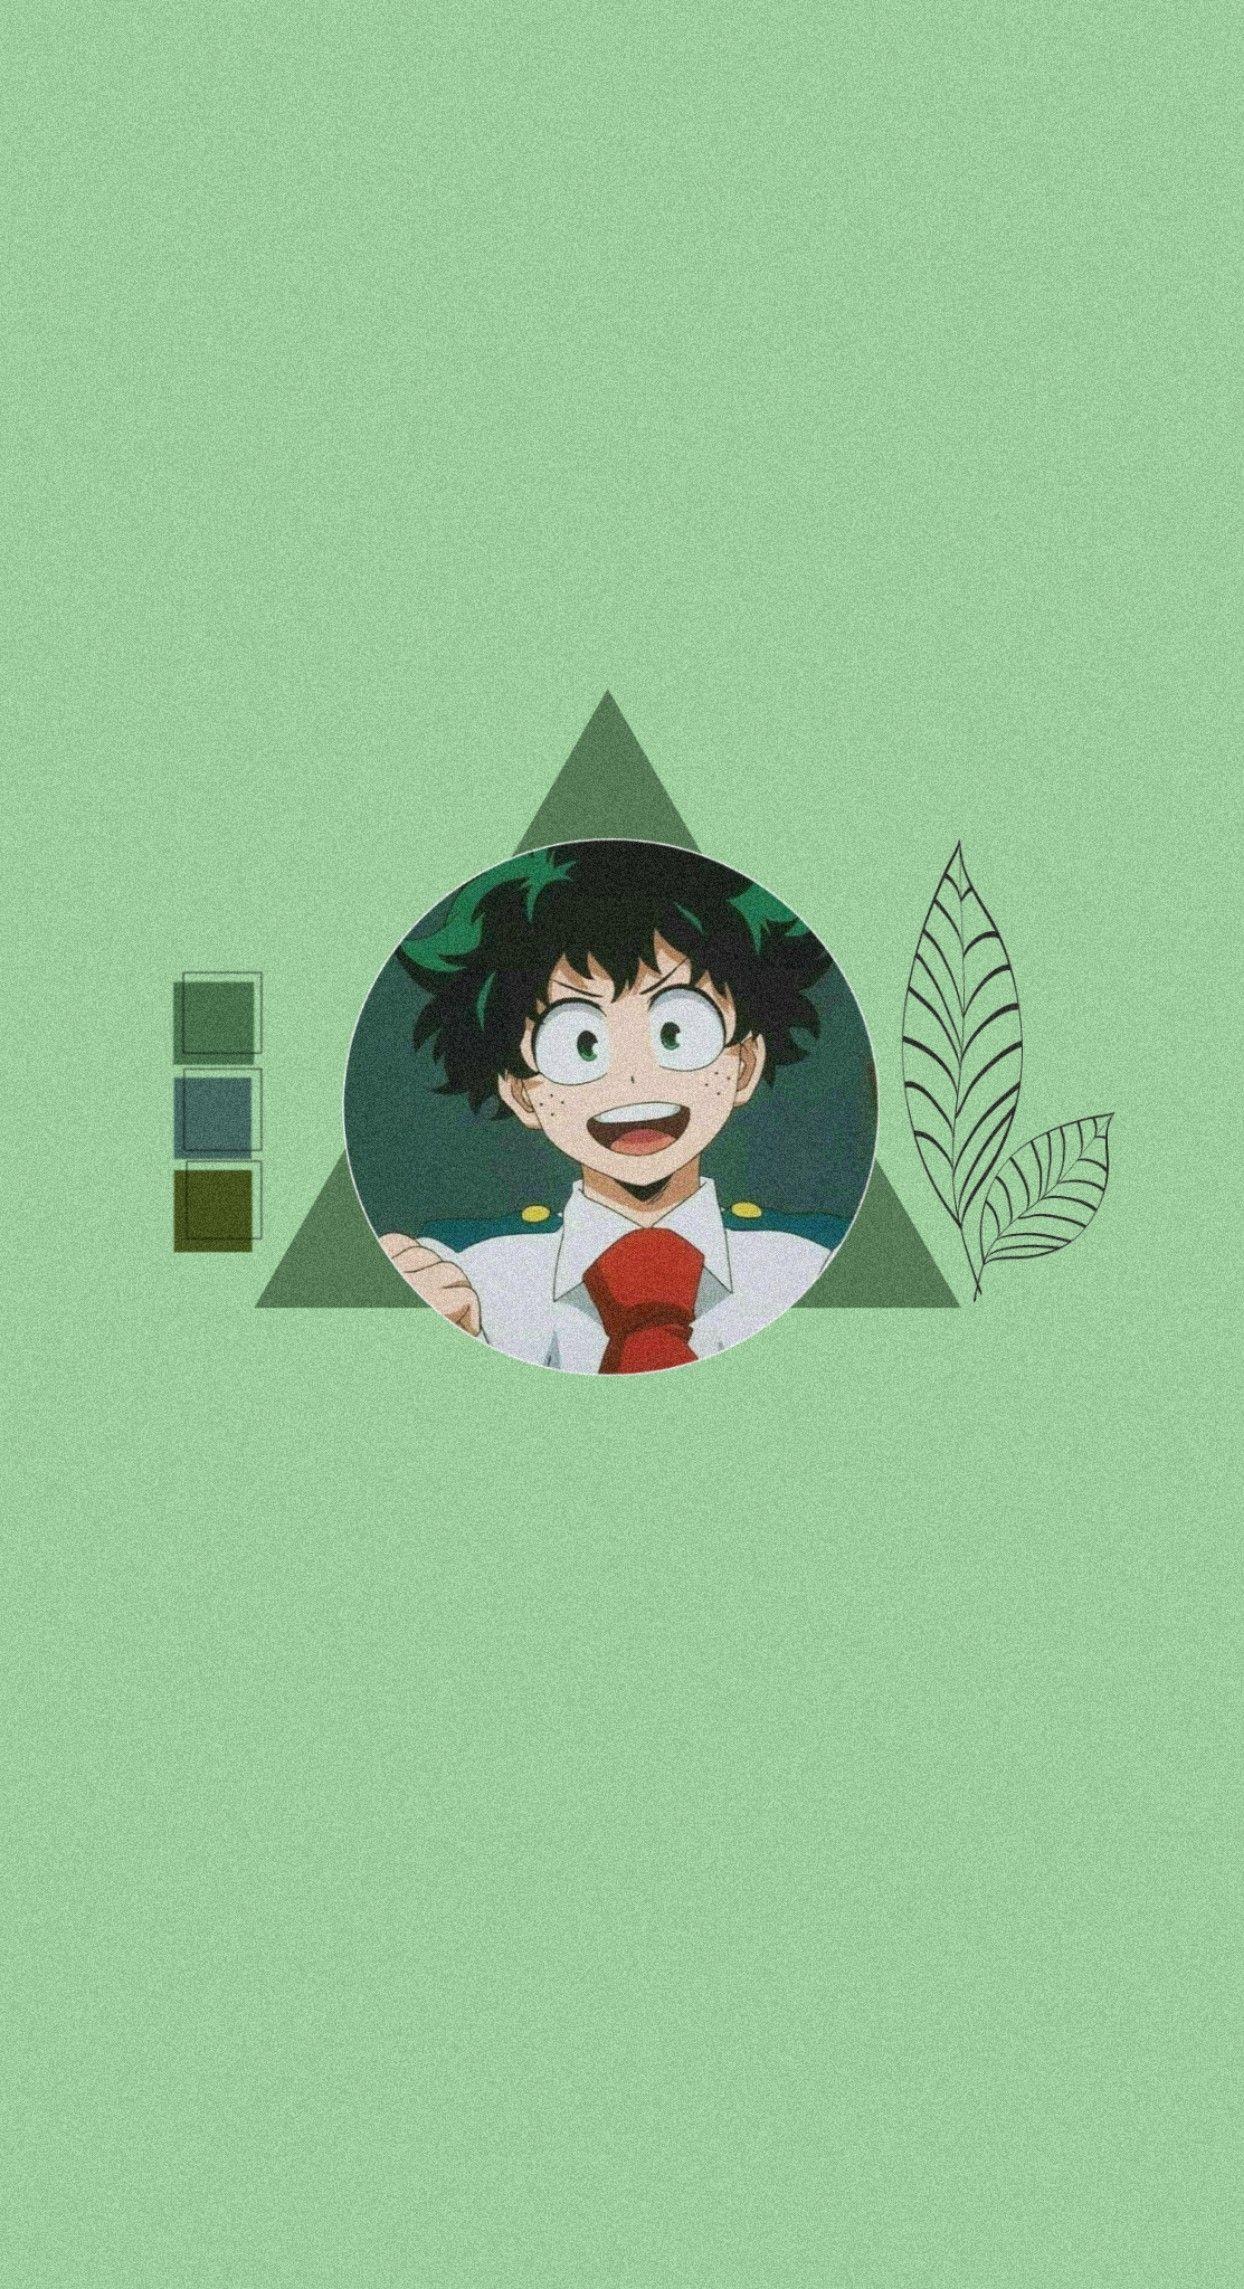 Deku Anime Wallpaper Iphone Hero Wallpaper Anime Wallpaper Anime boy ego wallpaper